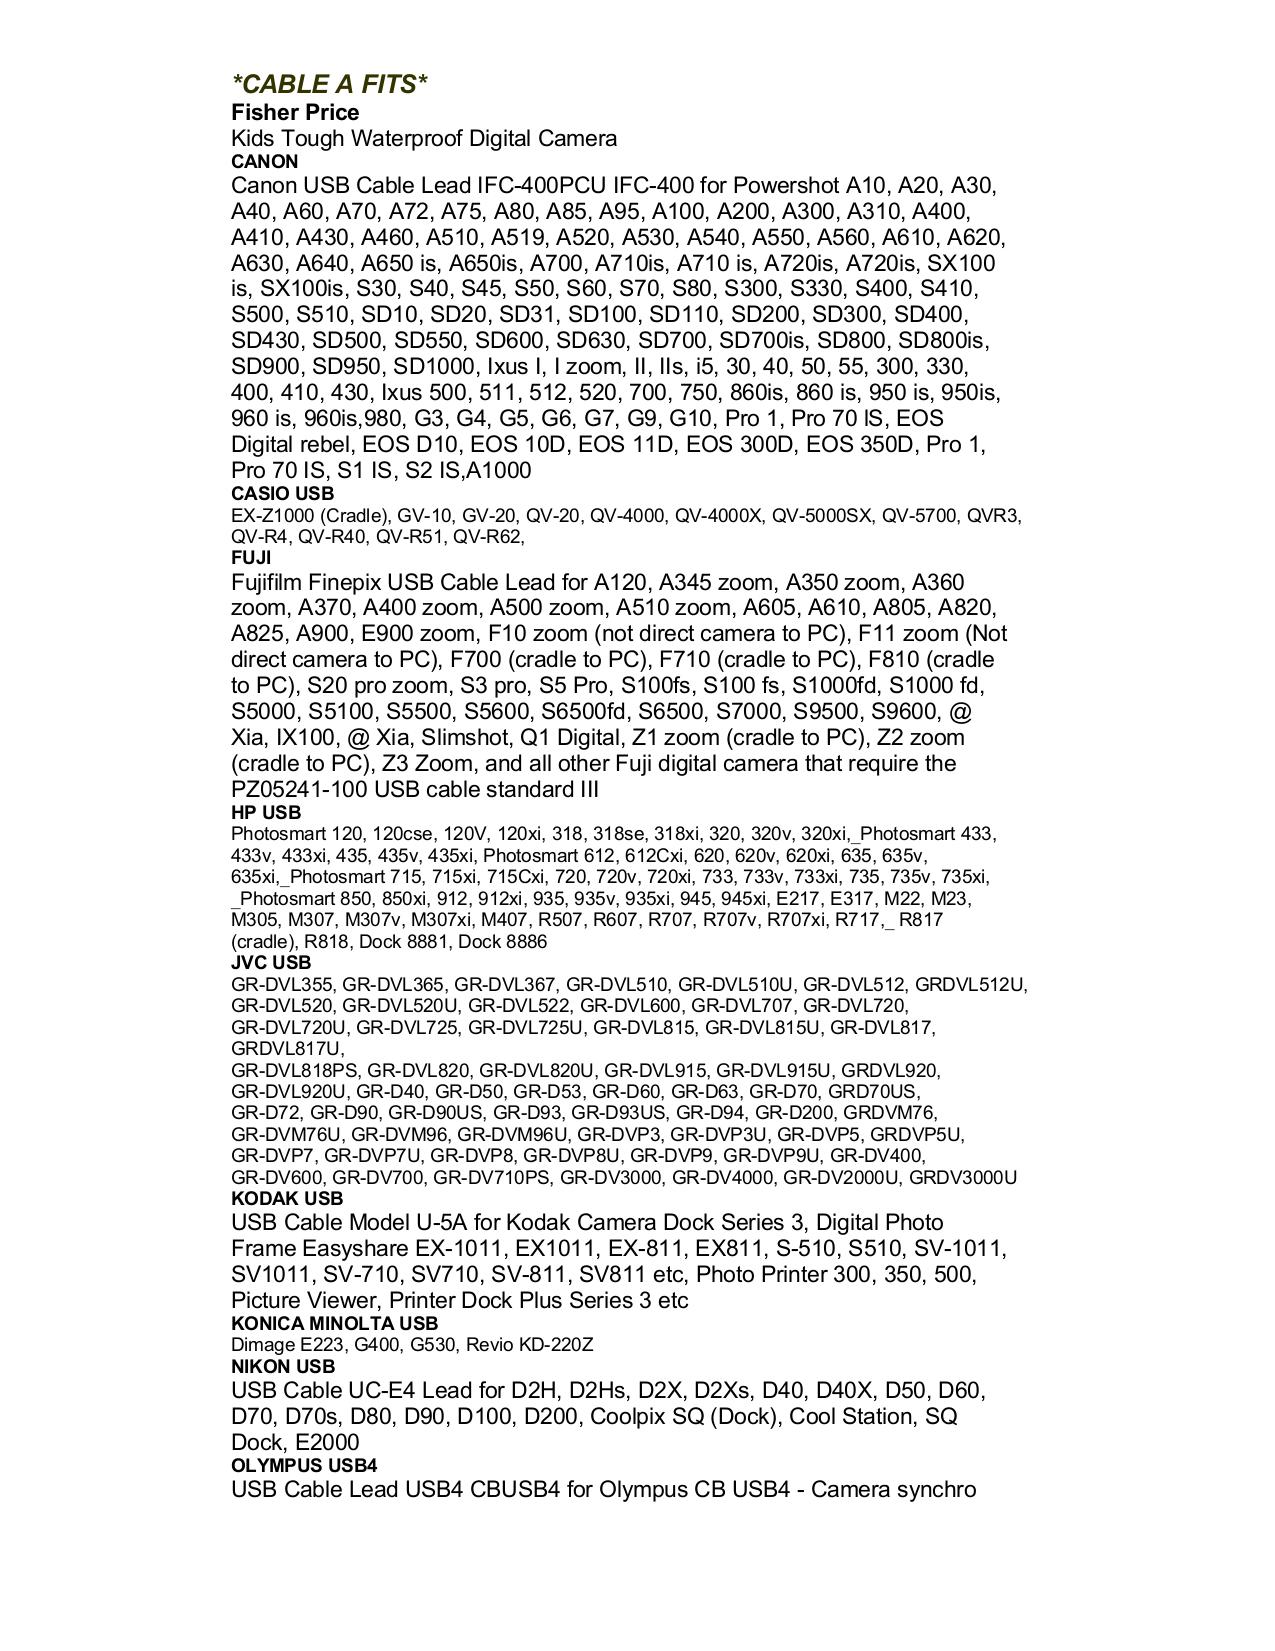 pdf for Vivitar Digital Camera Vivicam 3765 manual